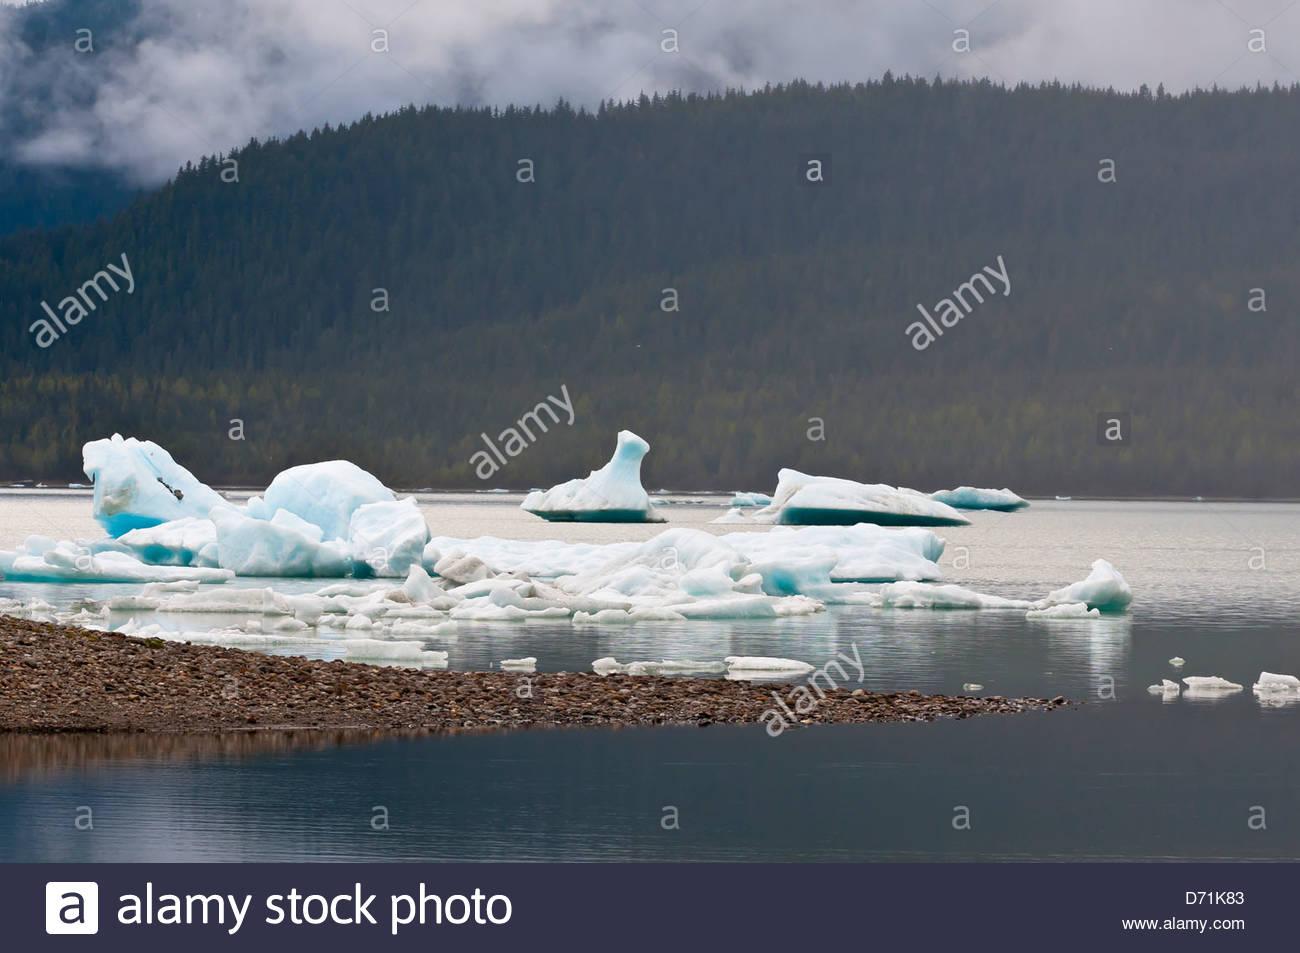 Mendenhall Lake (next to Mendenhall Glacier), Juneau, southeast Alaska USA Stock Photo